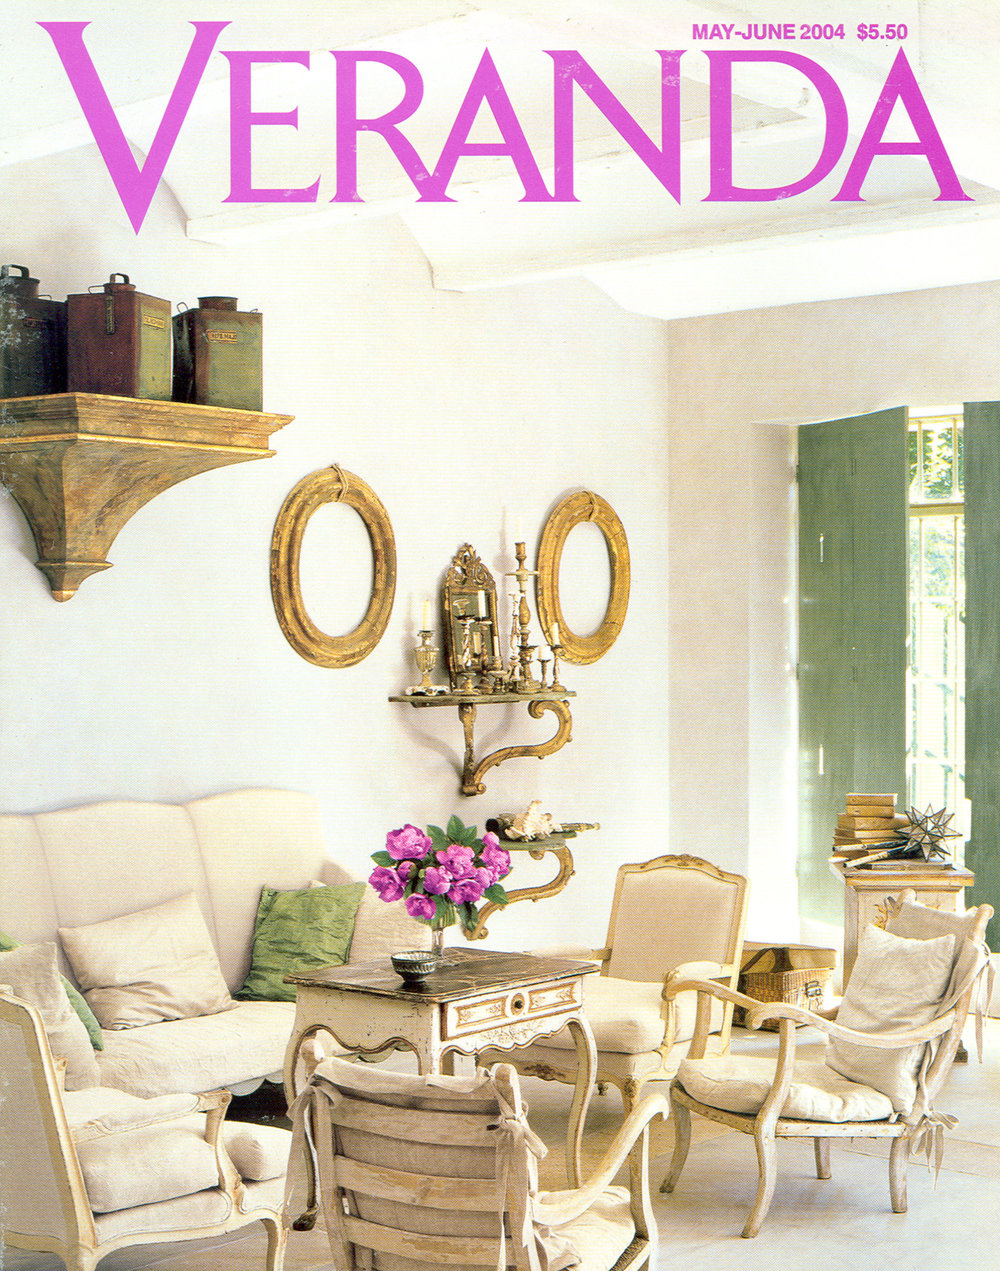 VERANDA - SANTA BARBARA